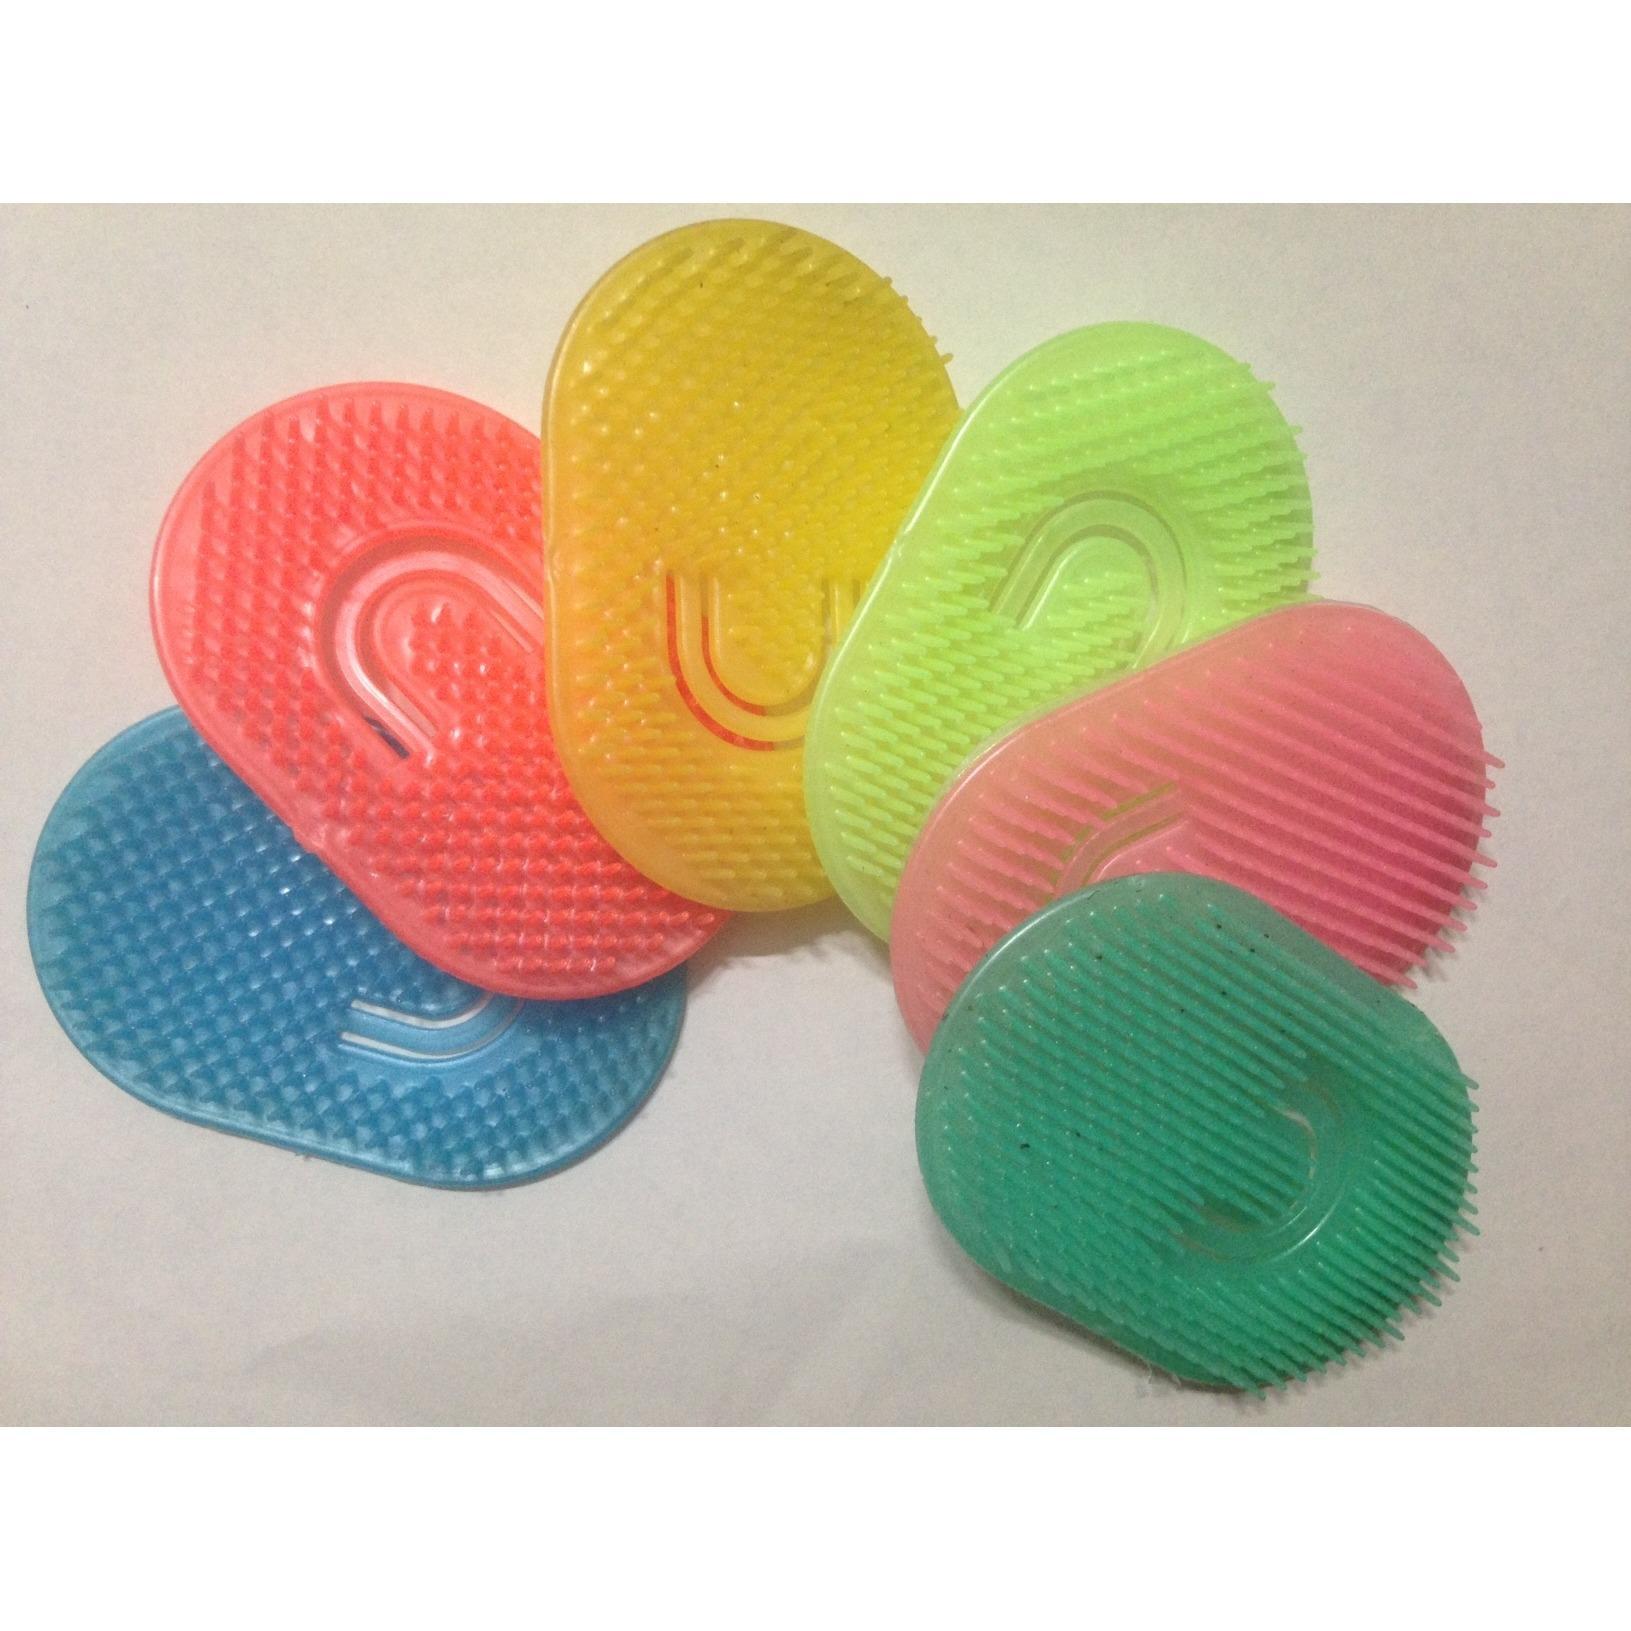 Combo 2 dụng cụ gội đầu - matxa da đầu bằng nhựa